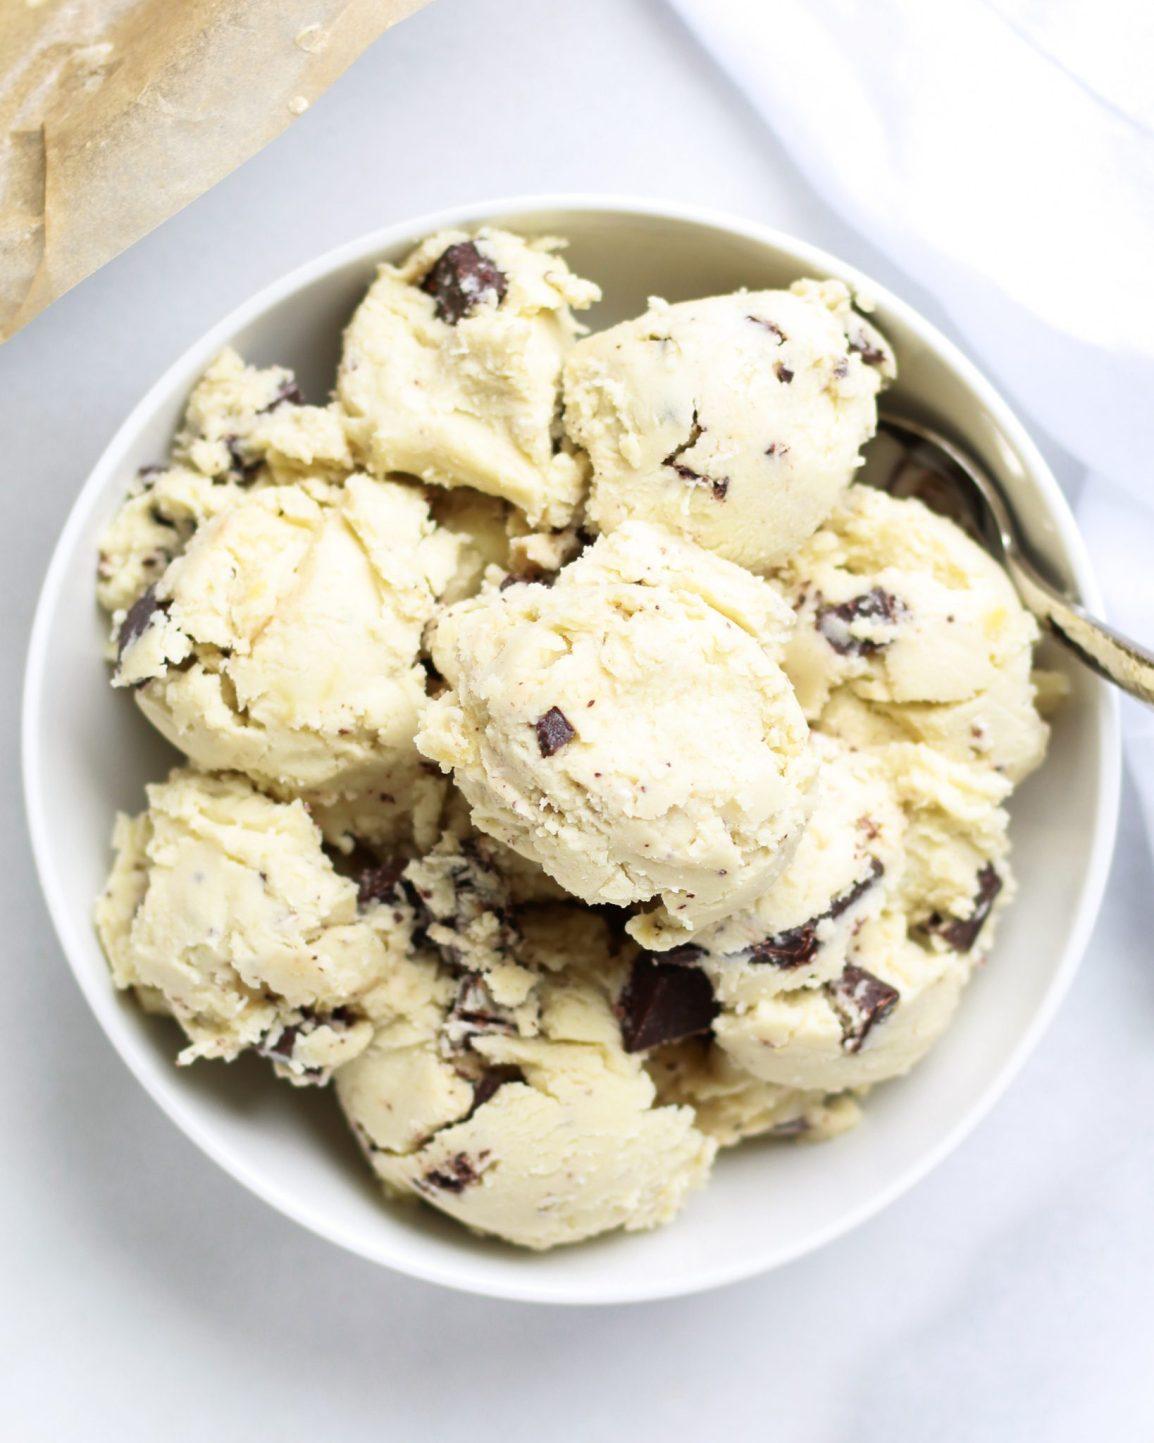 bowl of vegan vanilla ice cream with chocolate chips